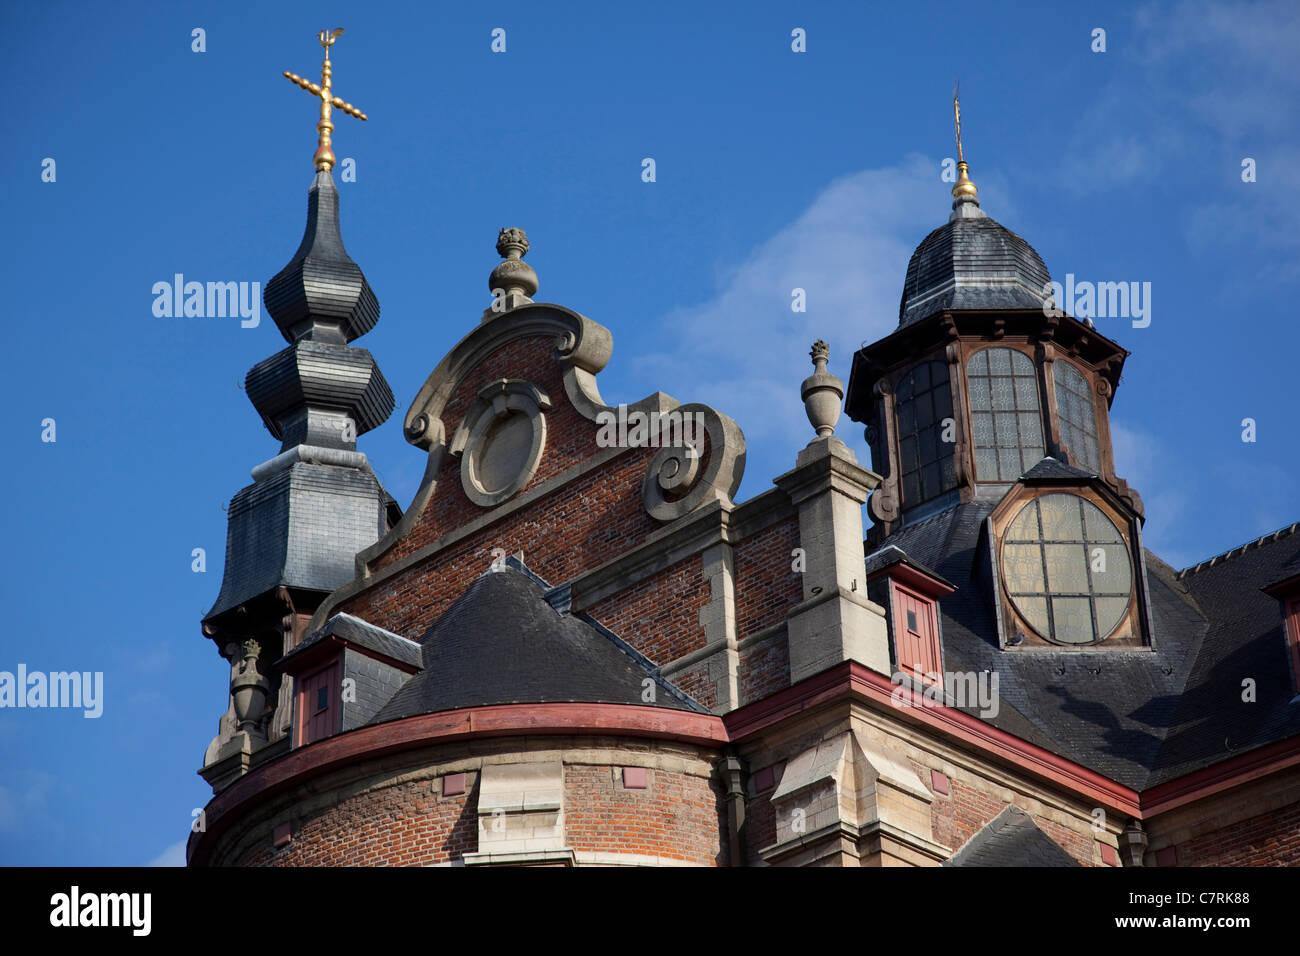 Belgium, Flanders, Brussels, Notre Dame aux Riches Claire, Church - Stock Image